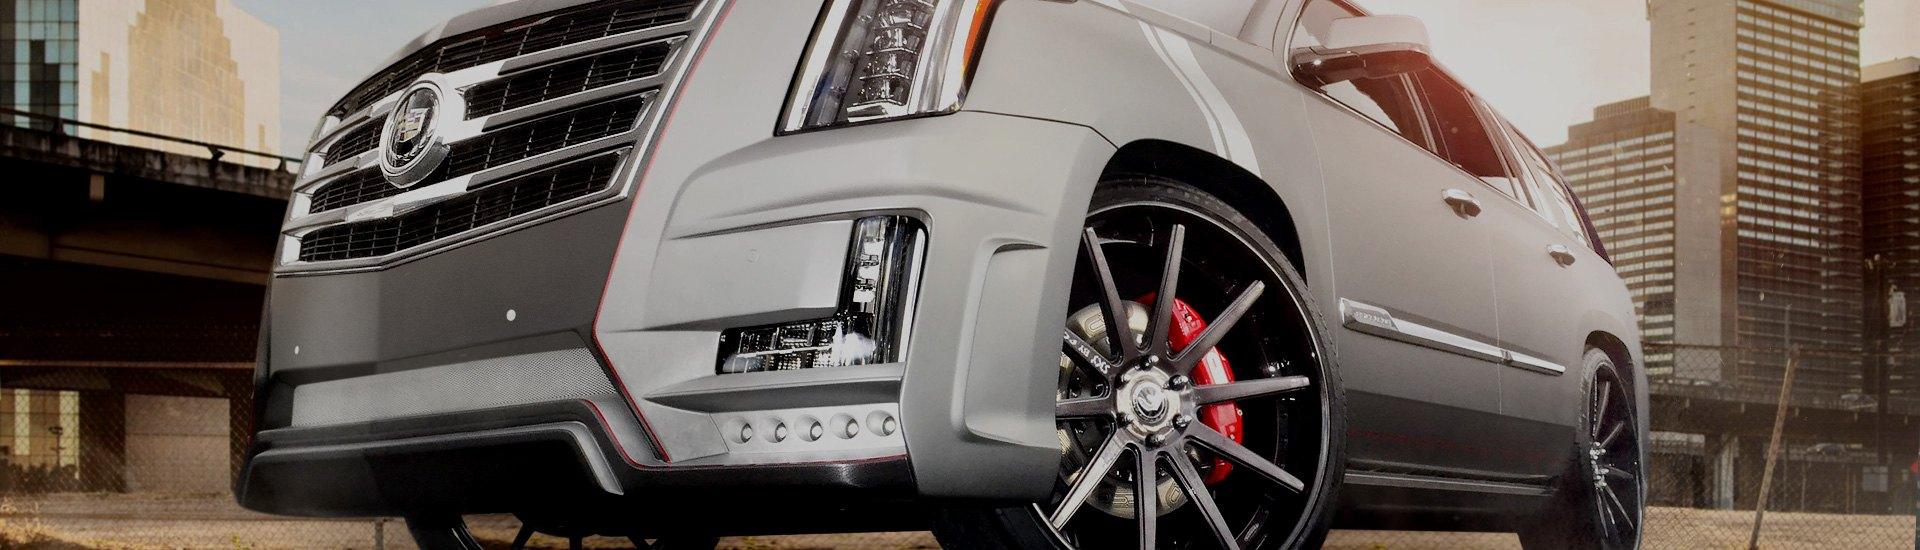 CARiD com - Auto Parts & Accessories | Car, Truck, SUV, Jeep